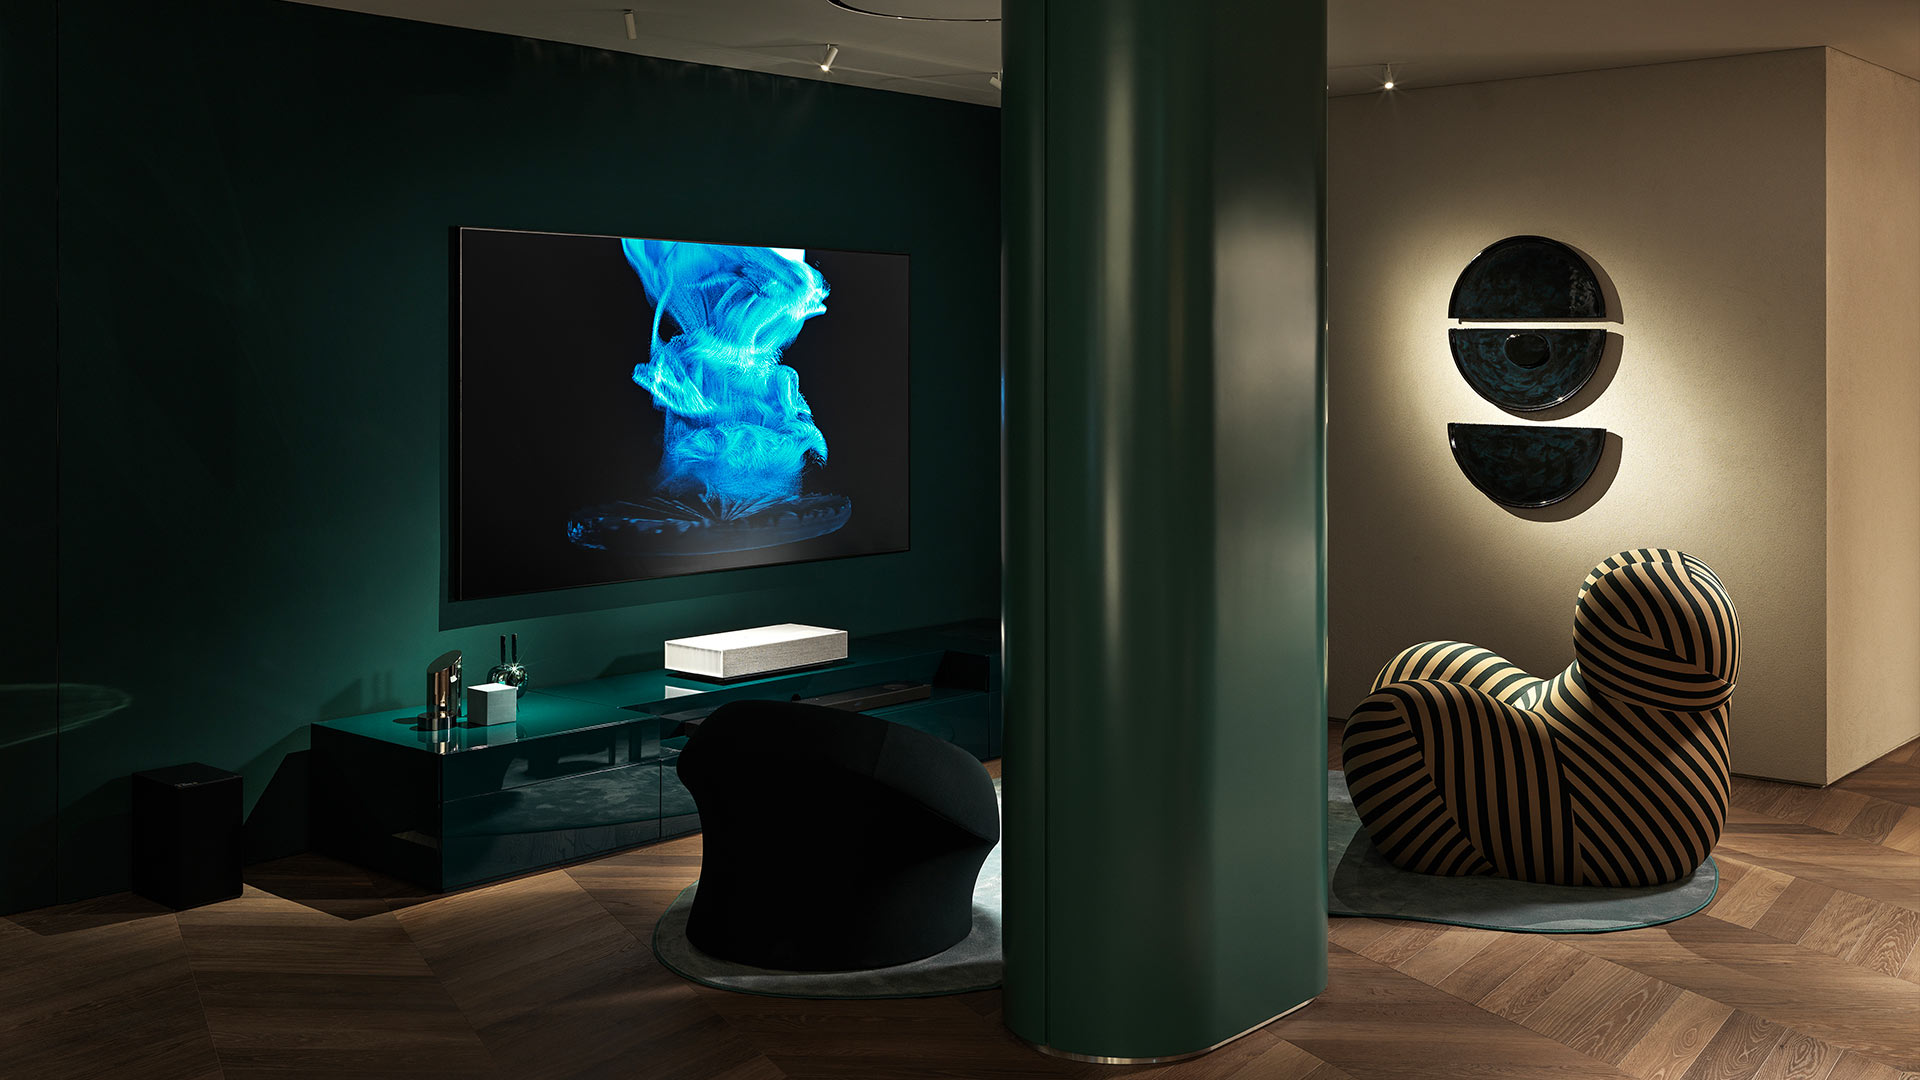 Basement showroom Signature kitchen Suite dettaglio TV